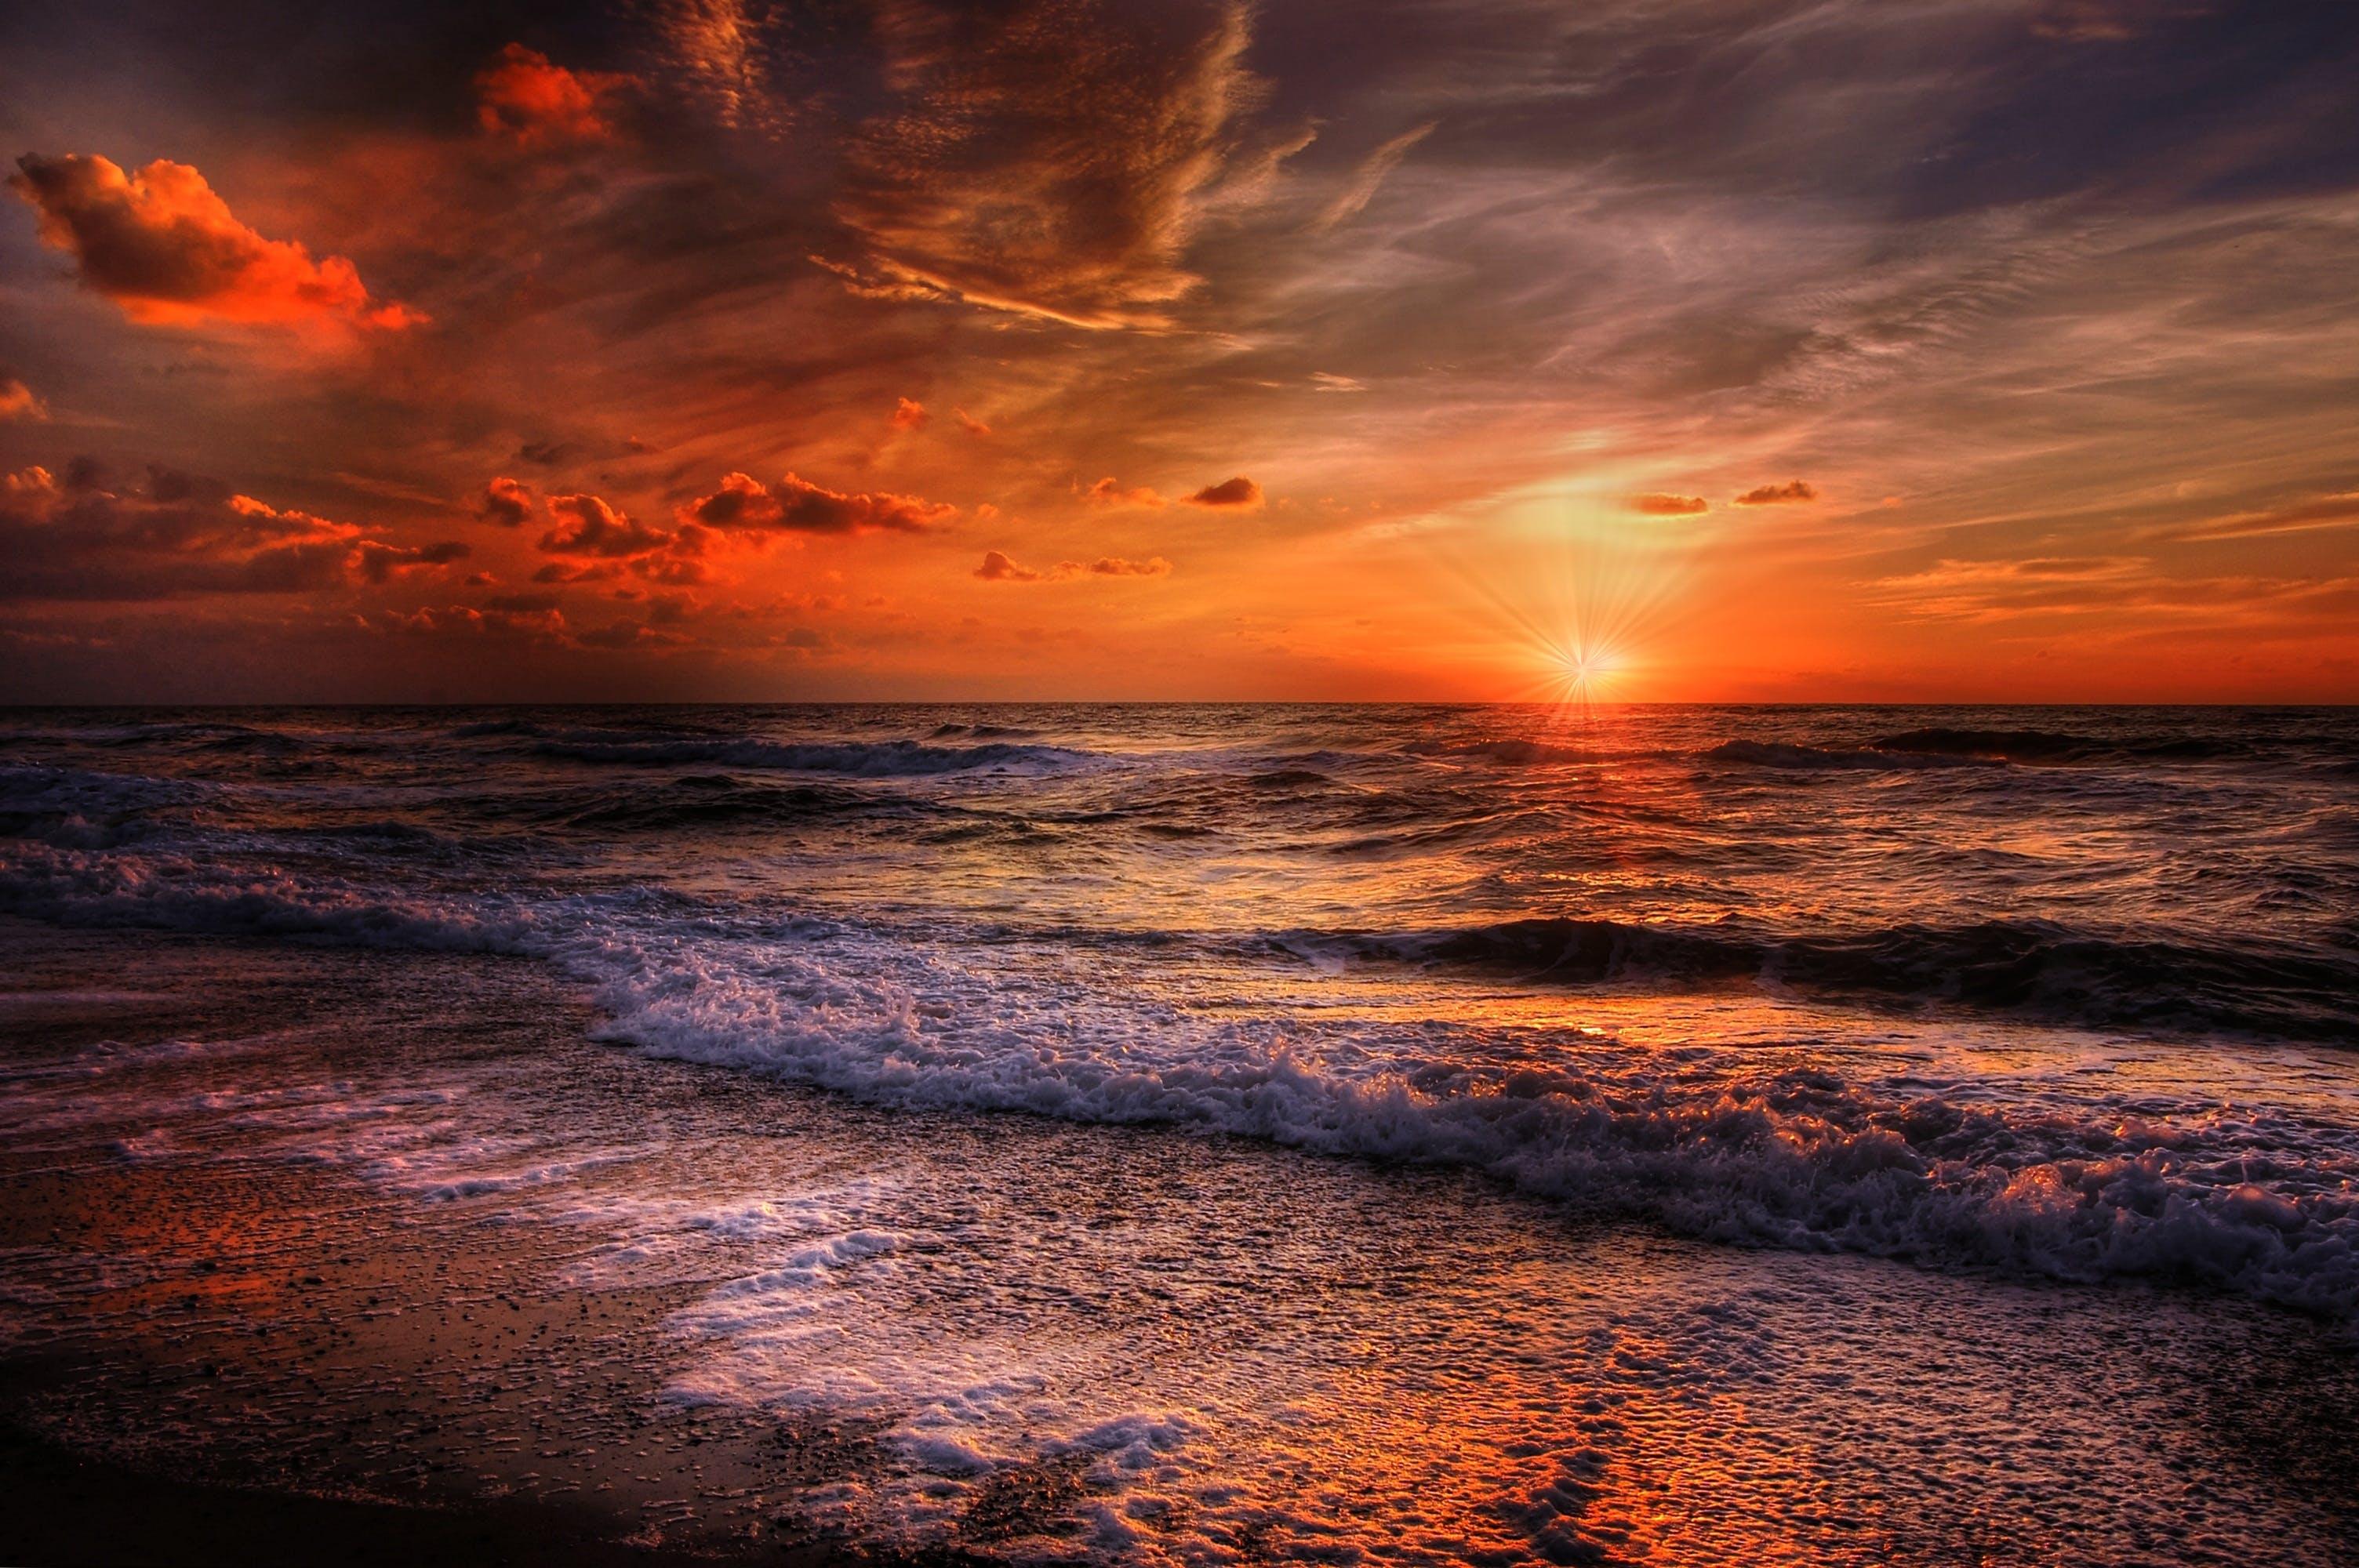 Kostenloses Stock Foto zu meer, himmel, sonnenuntergang, strand